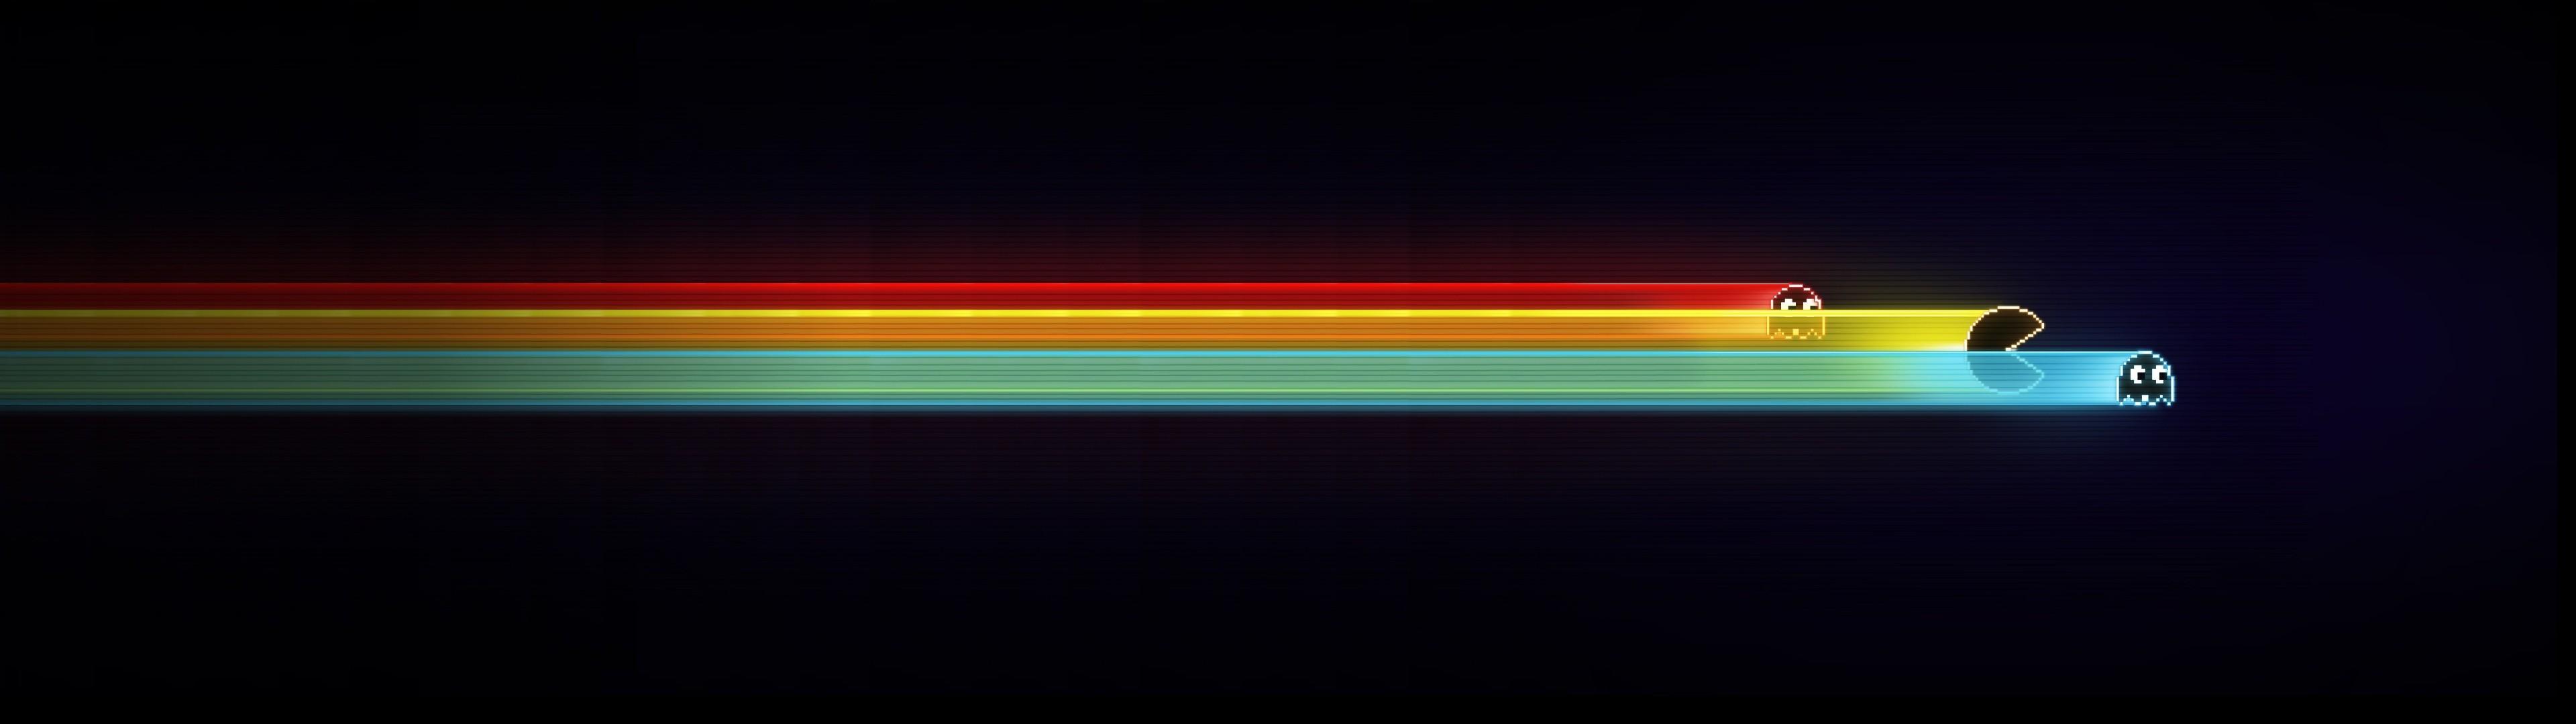 Res: 3840x1080, #Pacman wallpaper